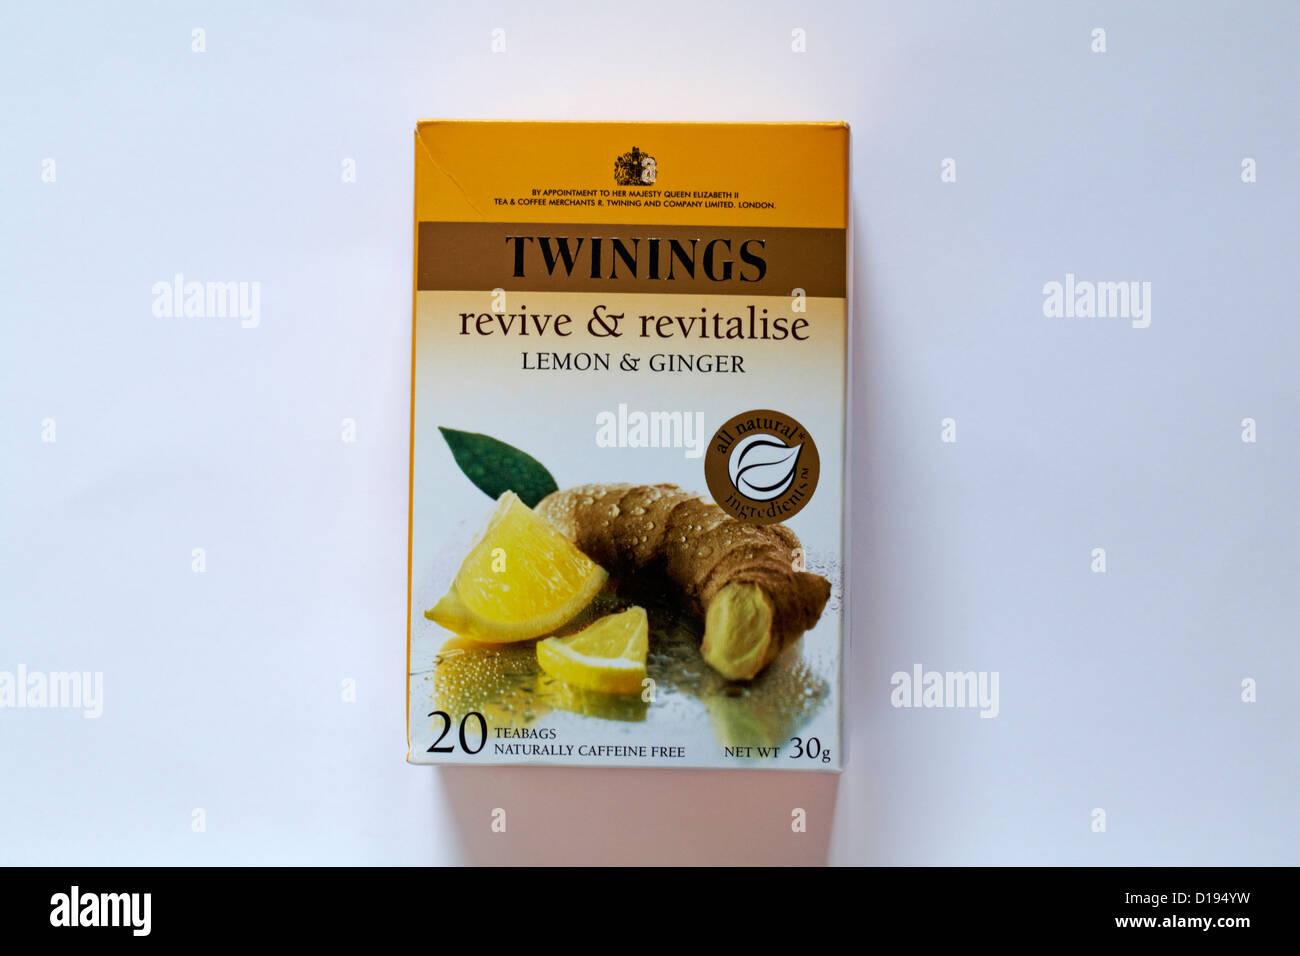 Twinings tea bags teabags - revive & revitalise lemon & ginger isolated on white background - Stock Image